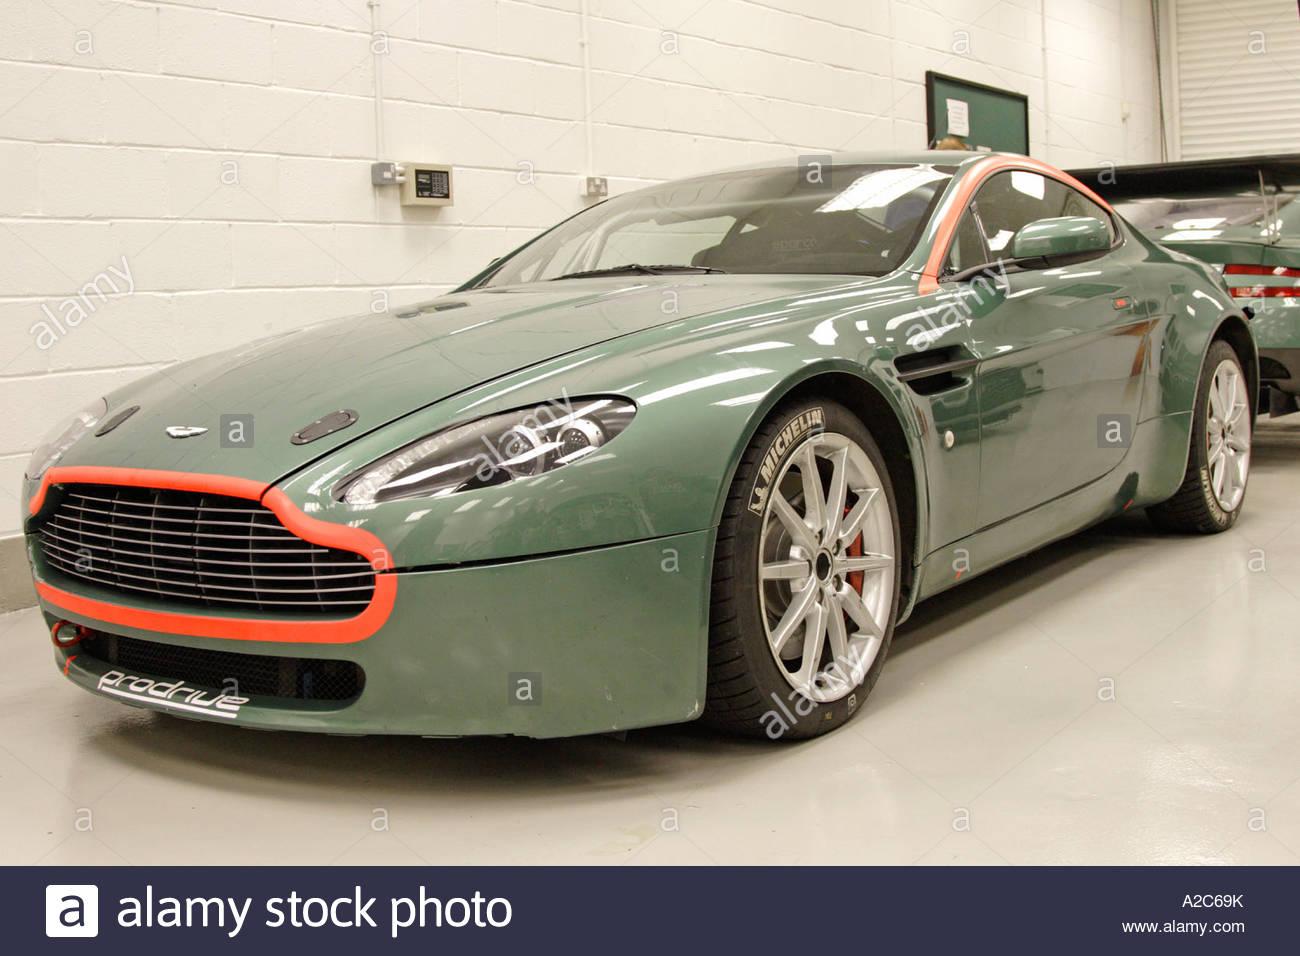 Nice Images Collection: Aston Martin V8 Vantage Rally GT Desktop Wallpapers